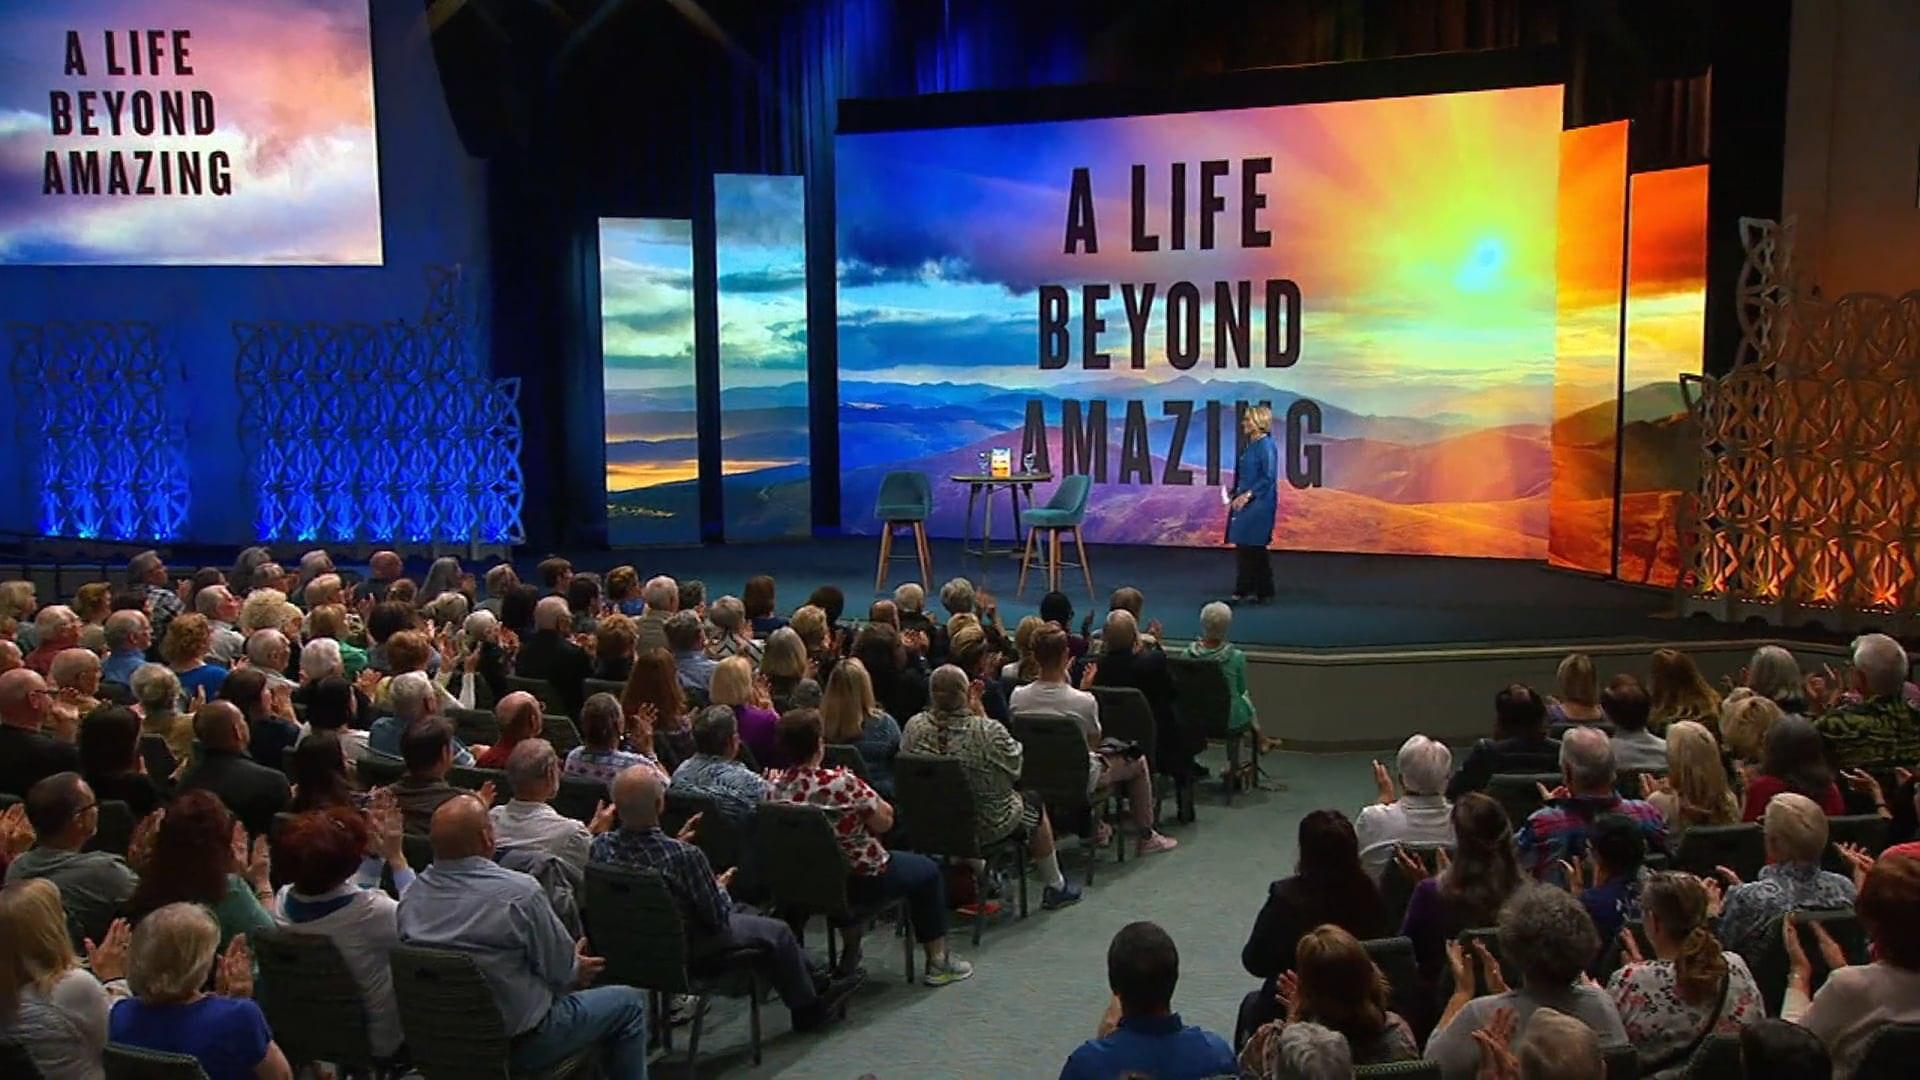 Watch A Life Beyond Amazing